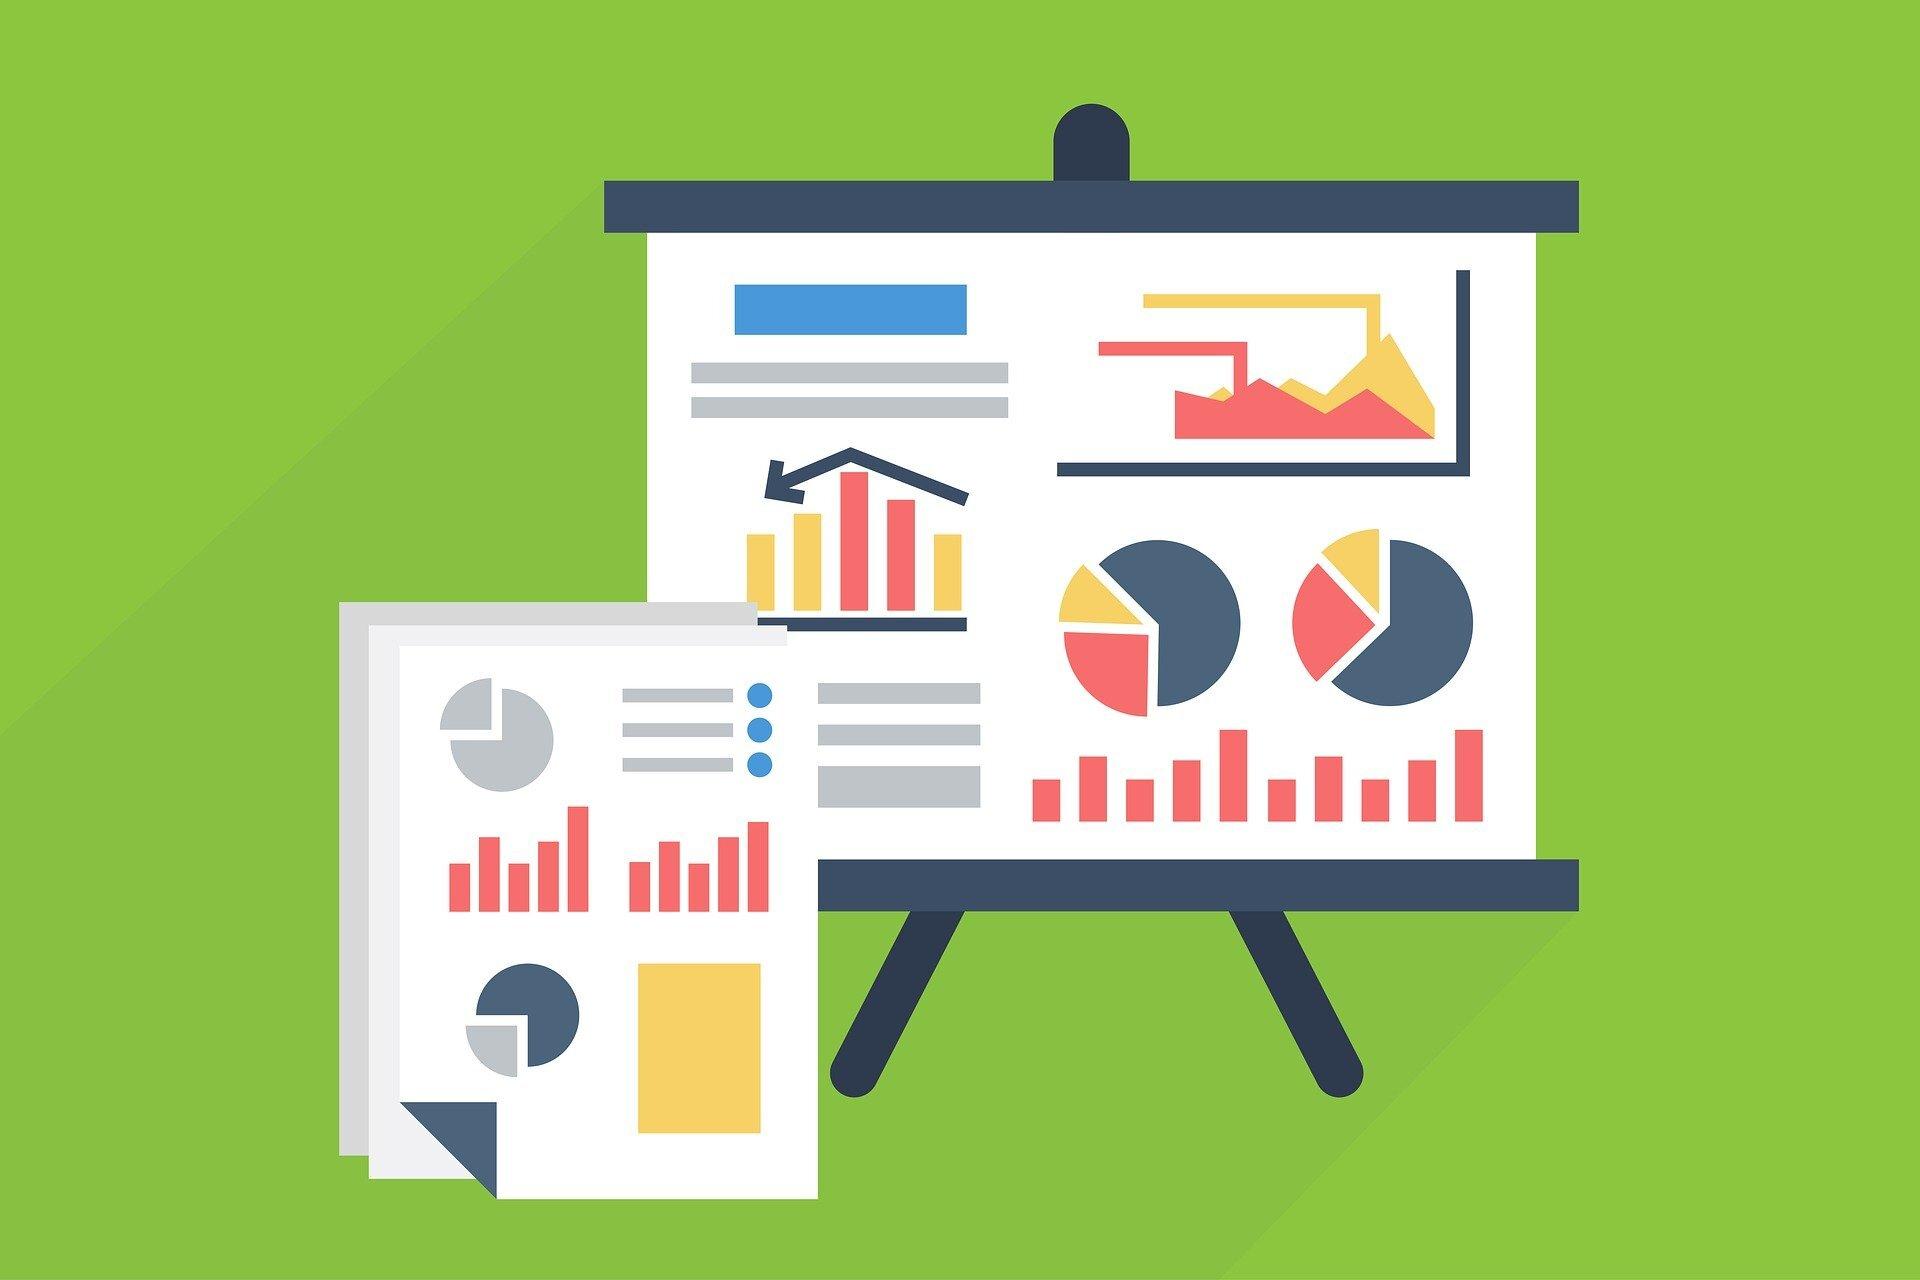 The essential social media metrics for success